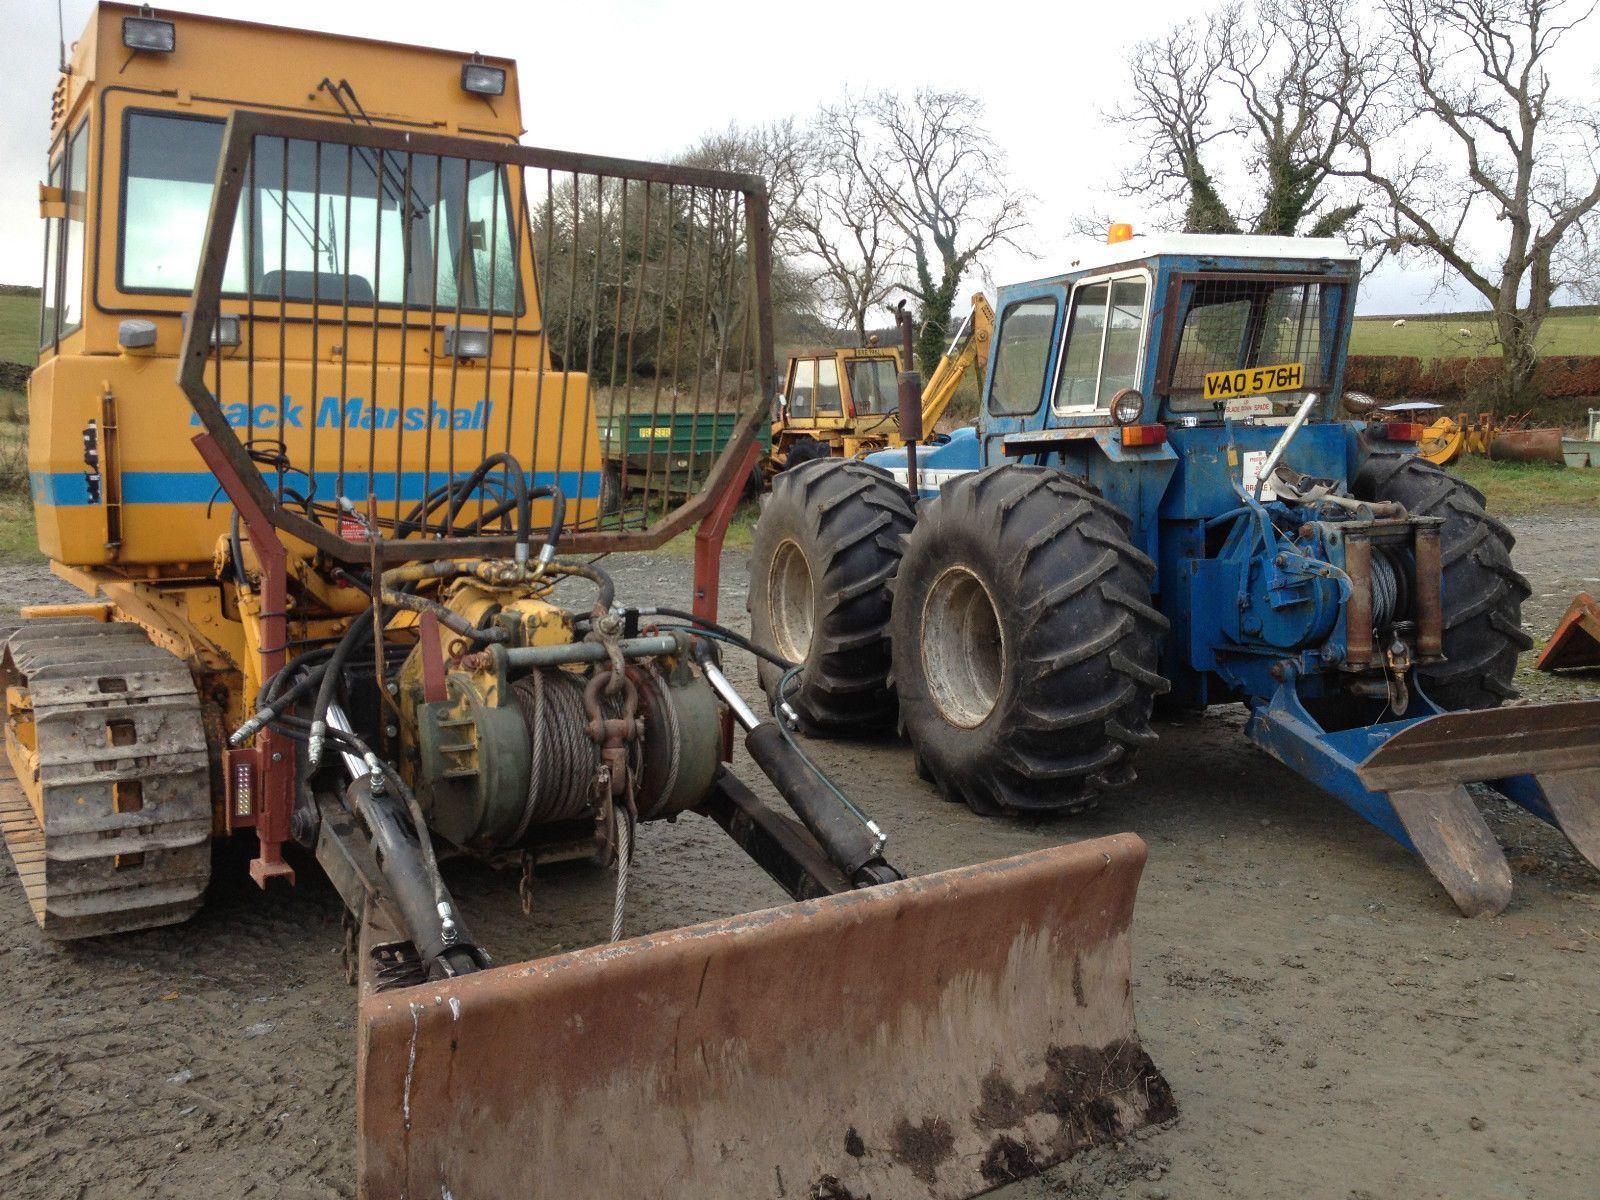 Three Point Winch : Hydraulic winch boughton ulrich rotzler superwinch tractor